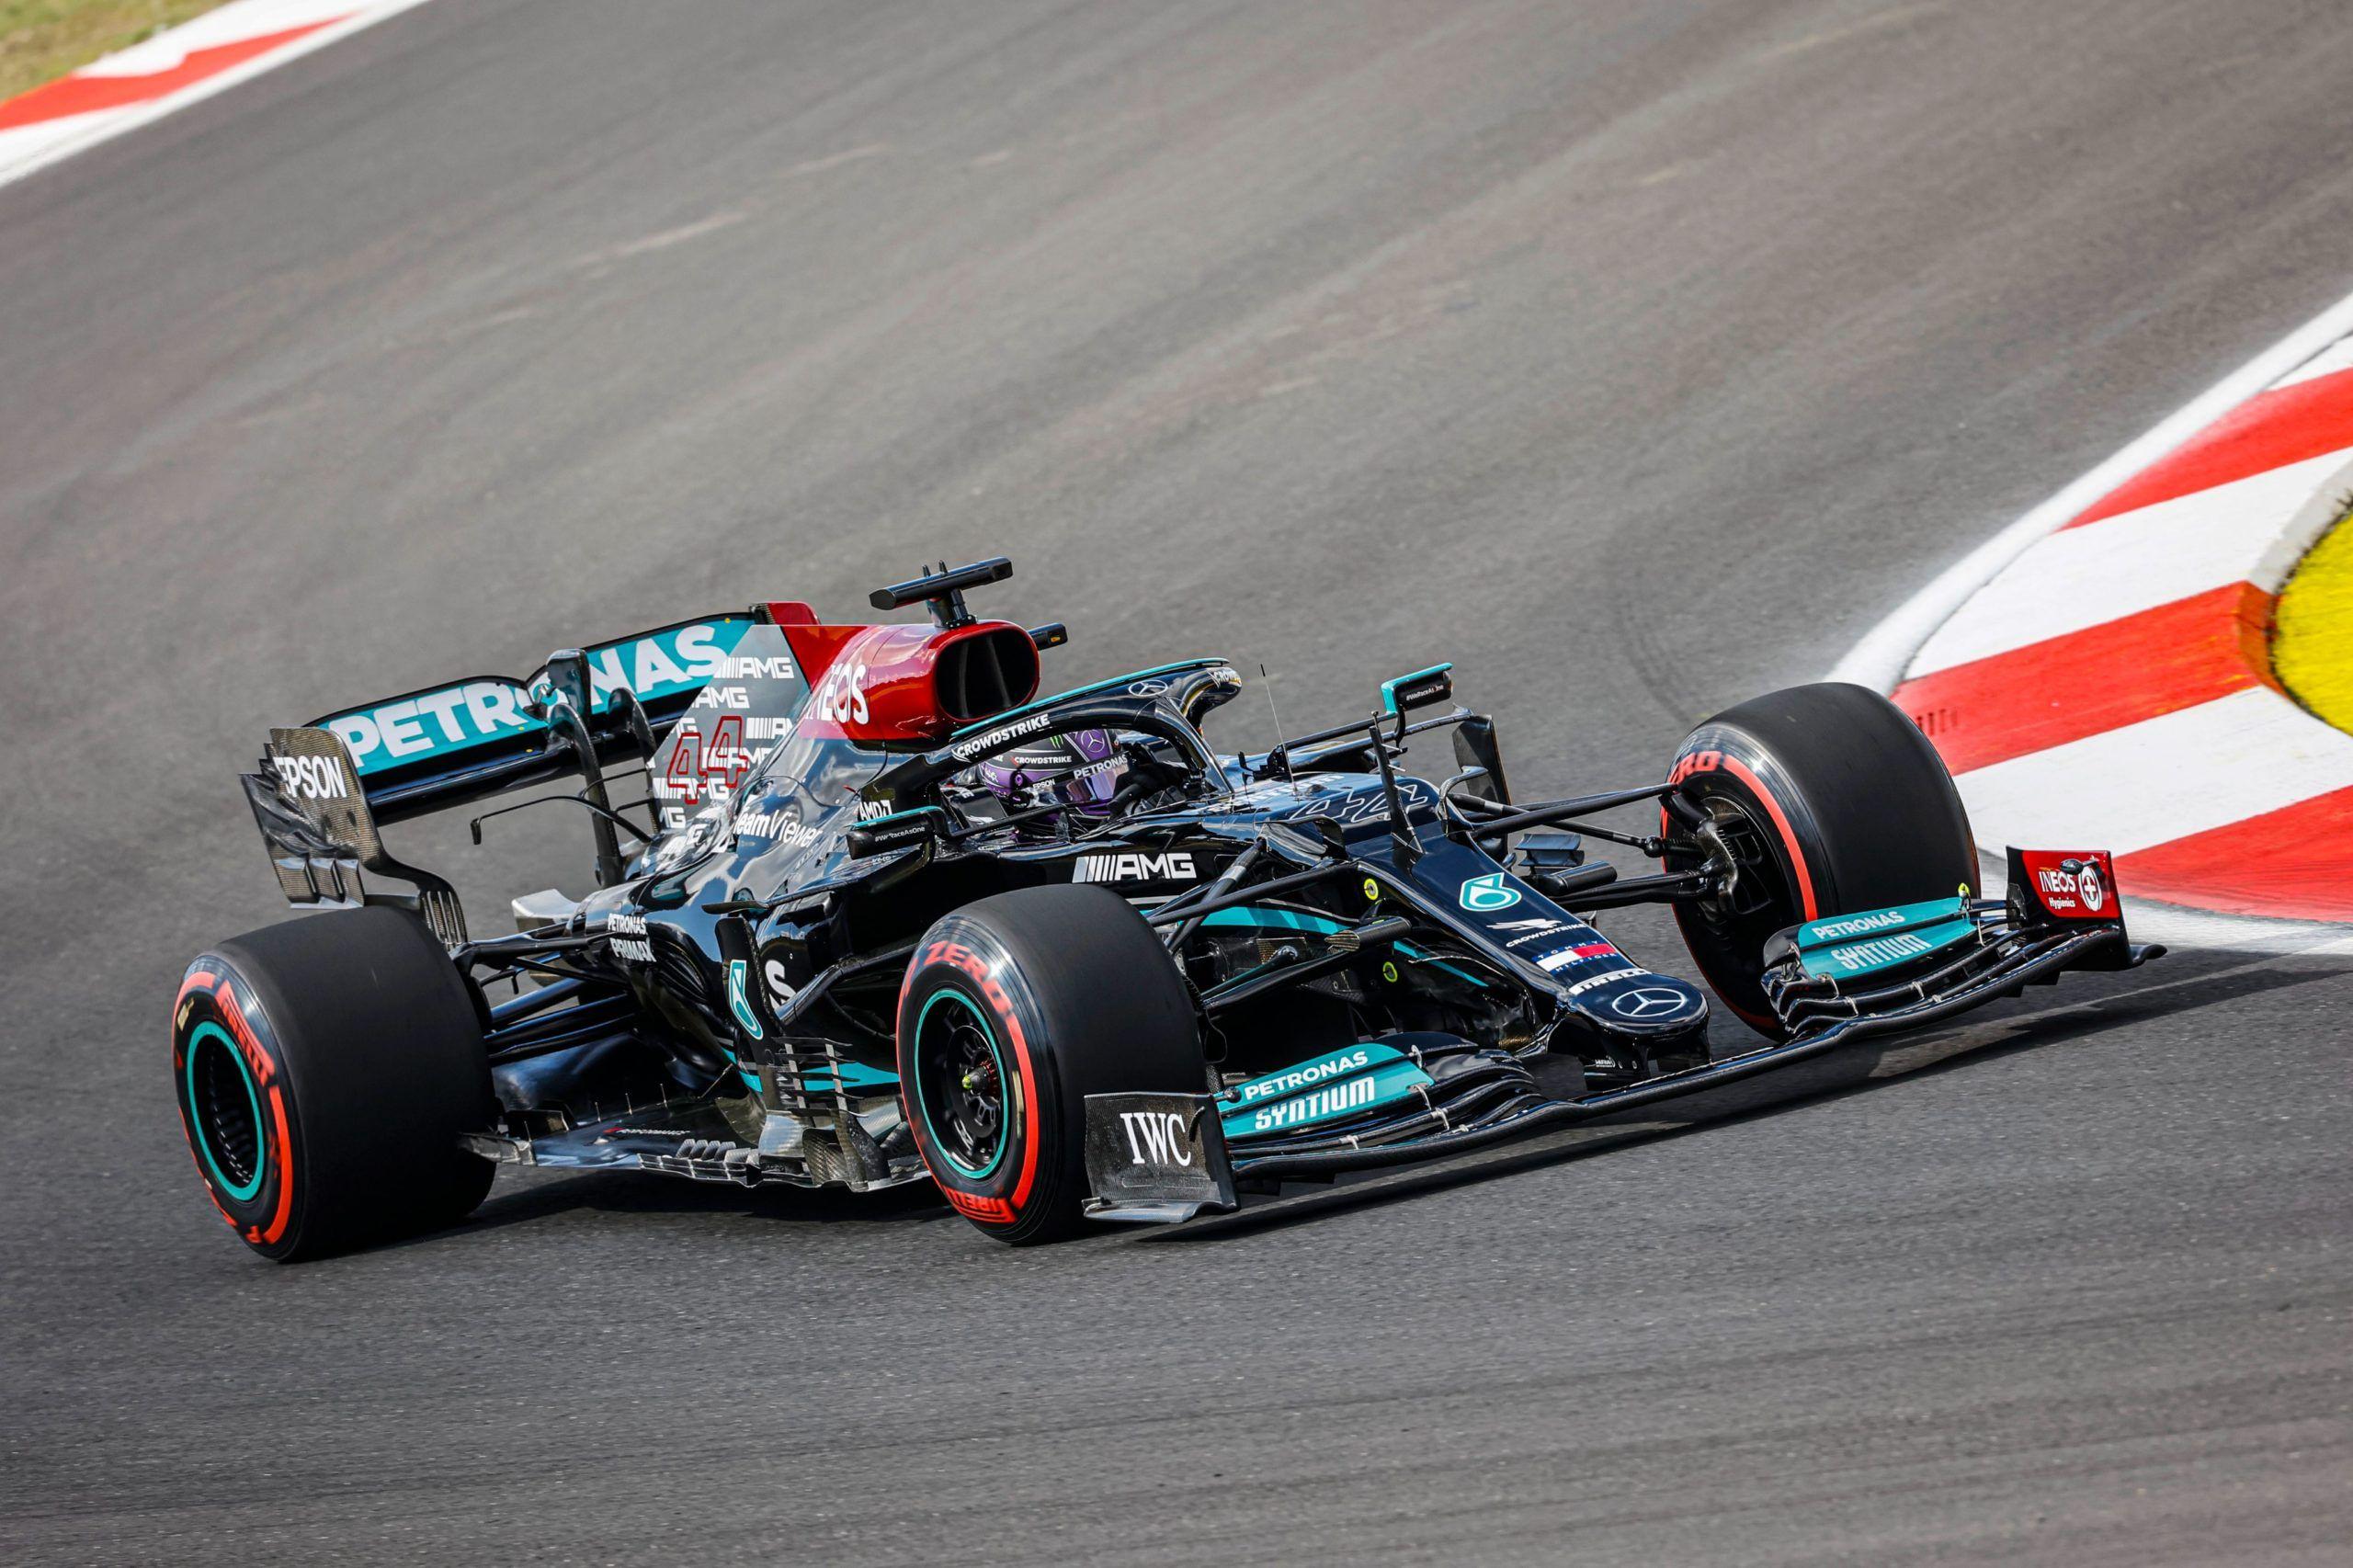 F1, Turkish GP, Lewis Hamilton